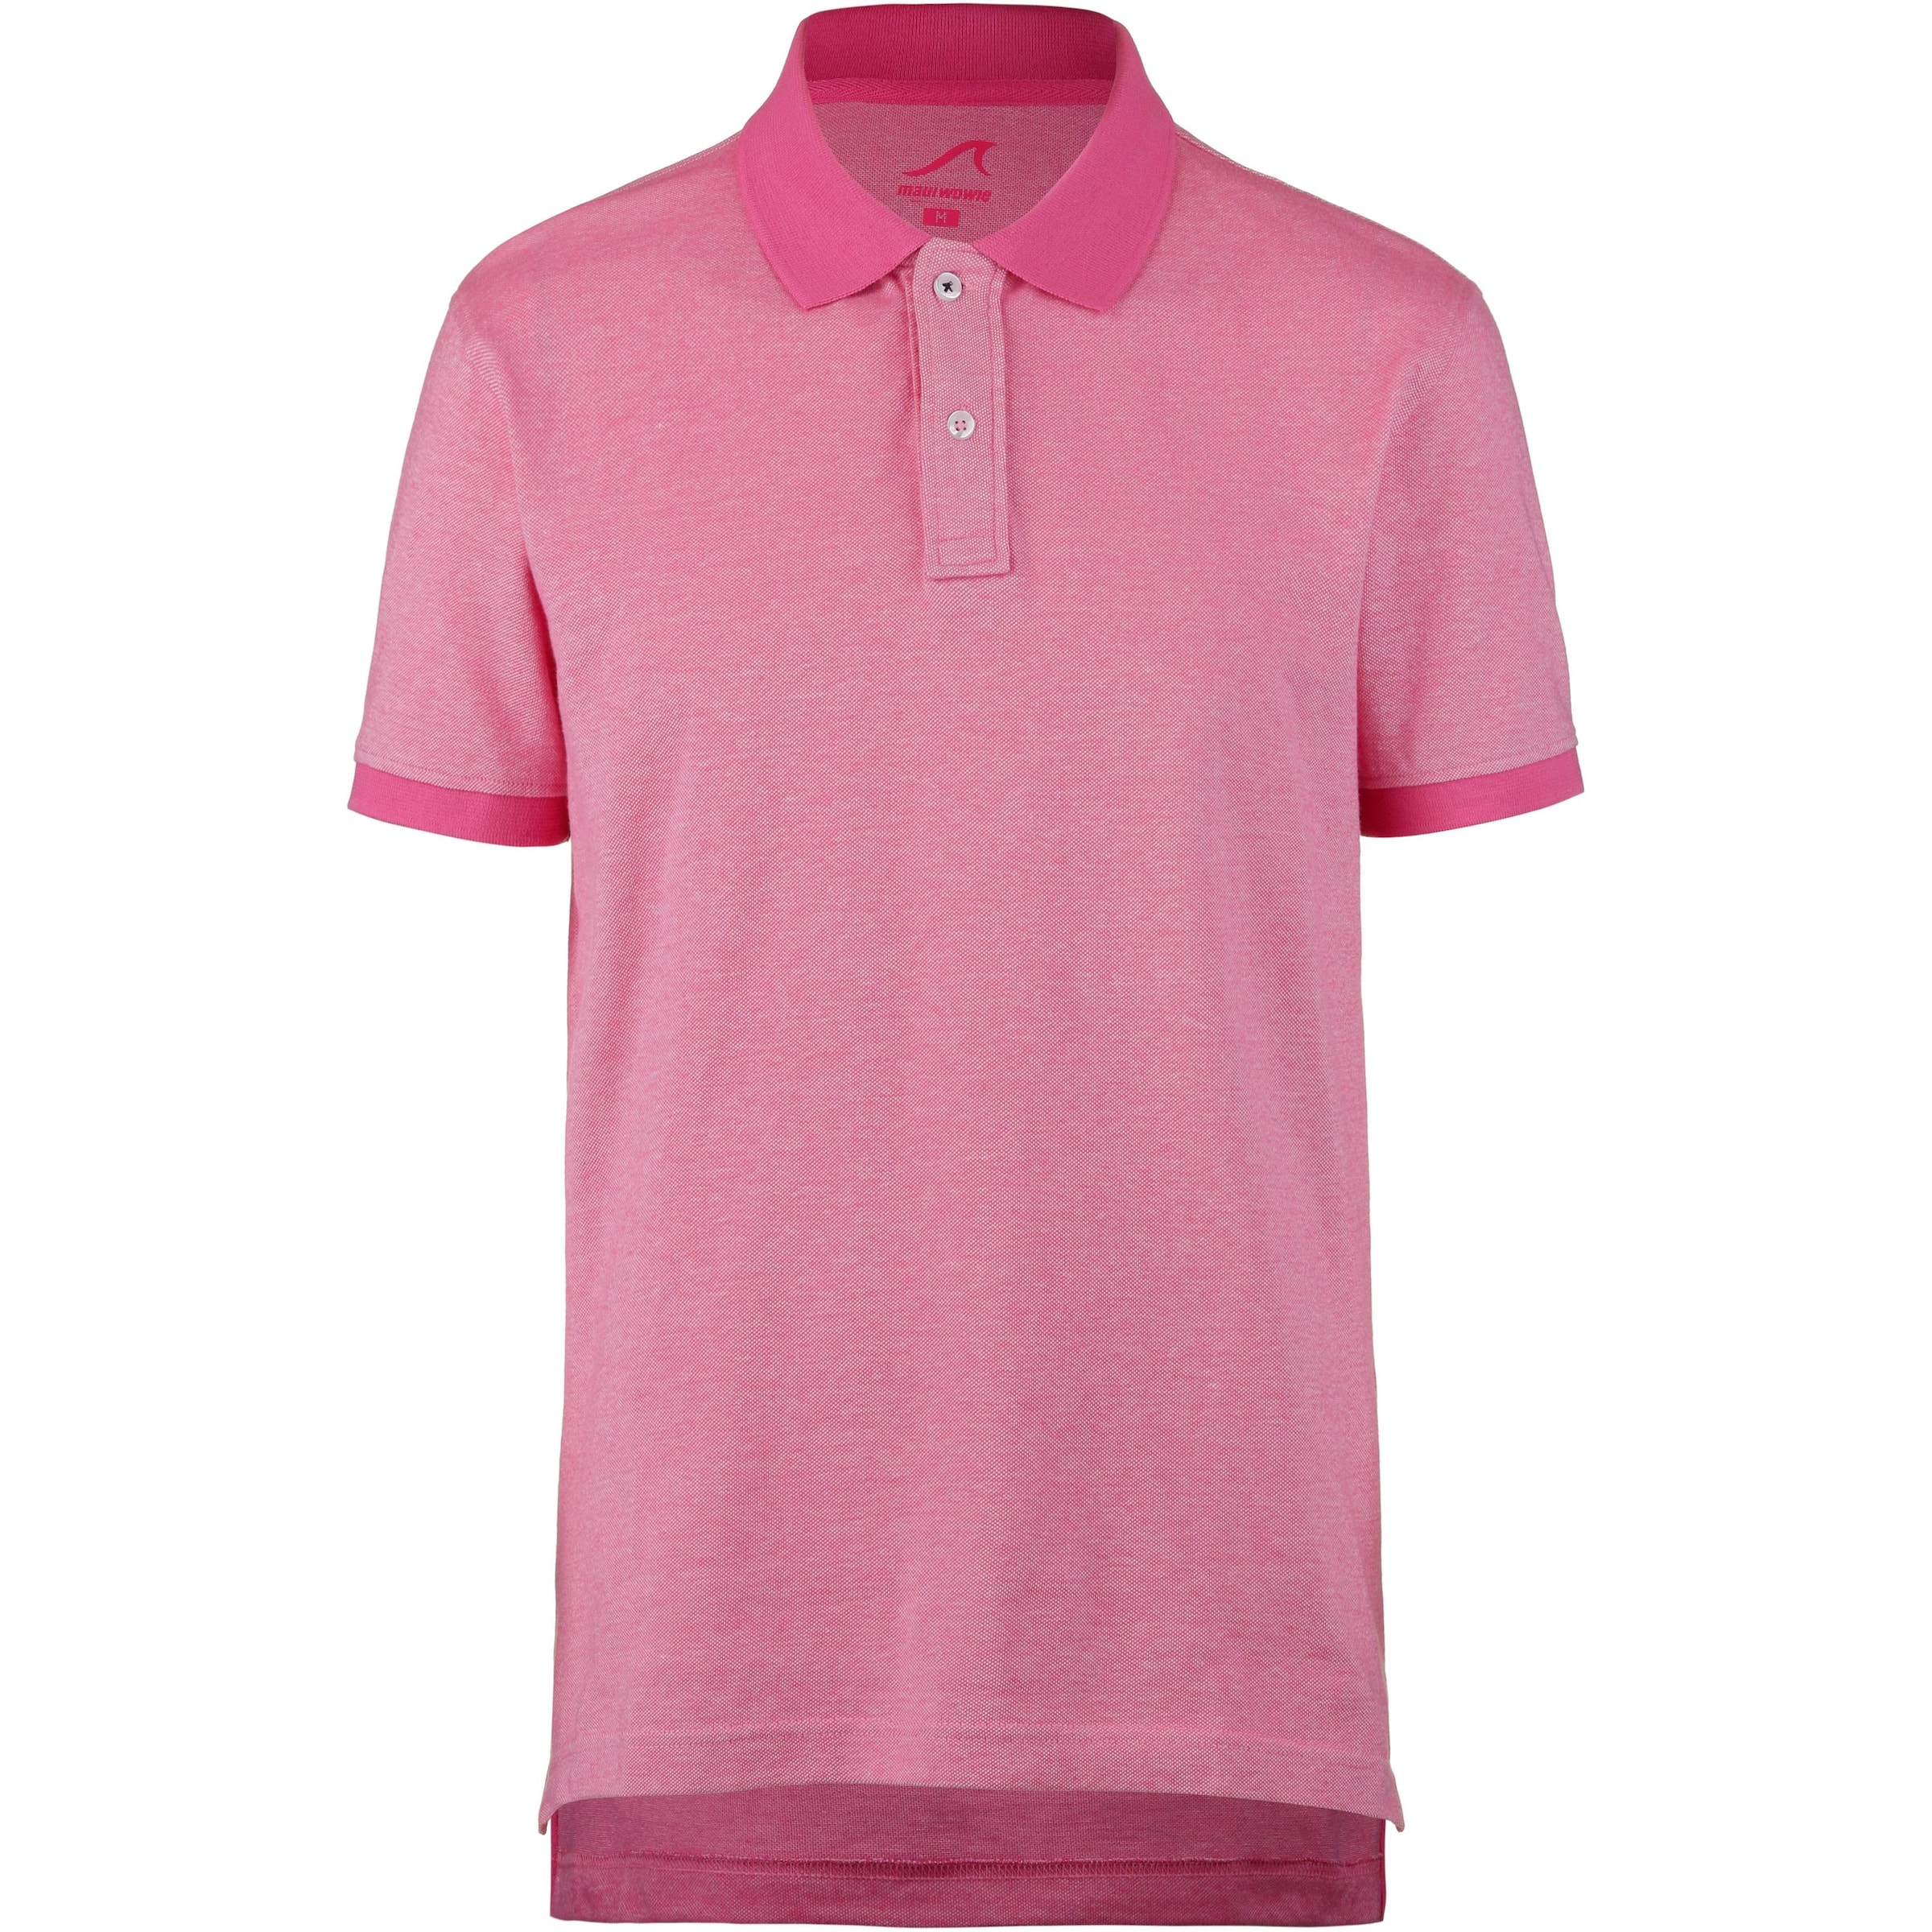 Poloshirt Poloshirt Maui Wowie In Pinkmeliert Wowie In Maui 80wnPOXk